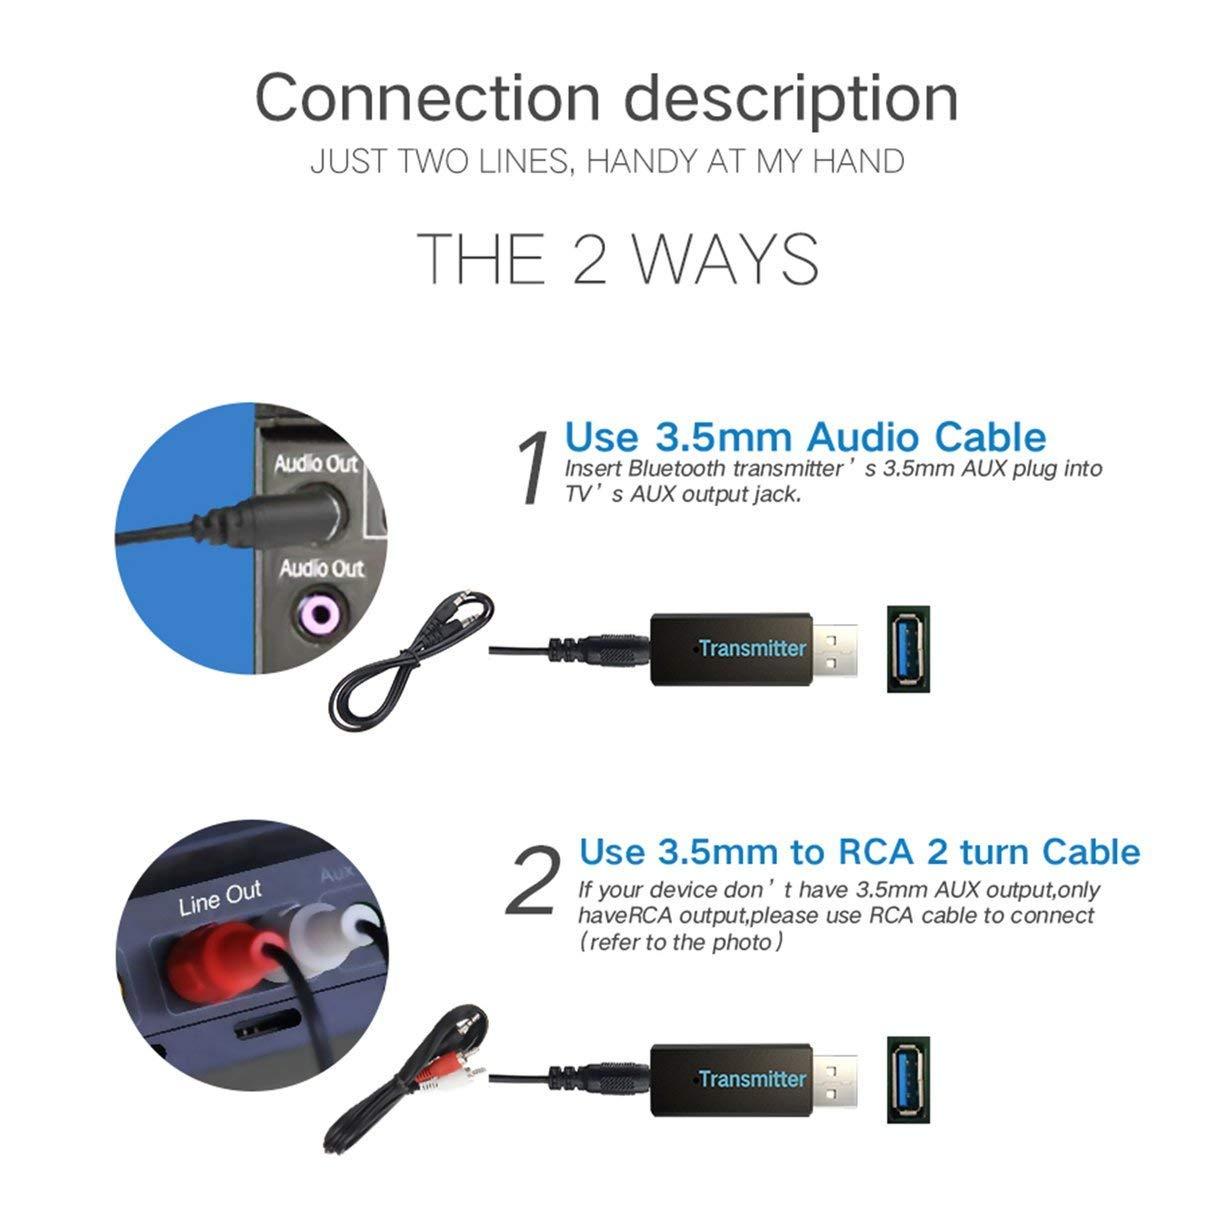 Funkadapter Hart Arbeitend Kn316 Usb Wireless Bluetooth 3,0 Transmitter Mini Tragbare Audio Sender A2dp Musik Stereo Dongle Adapter Tv Pc Mp3 Einfach Zu Schmieren Tragbares Audio & Video